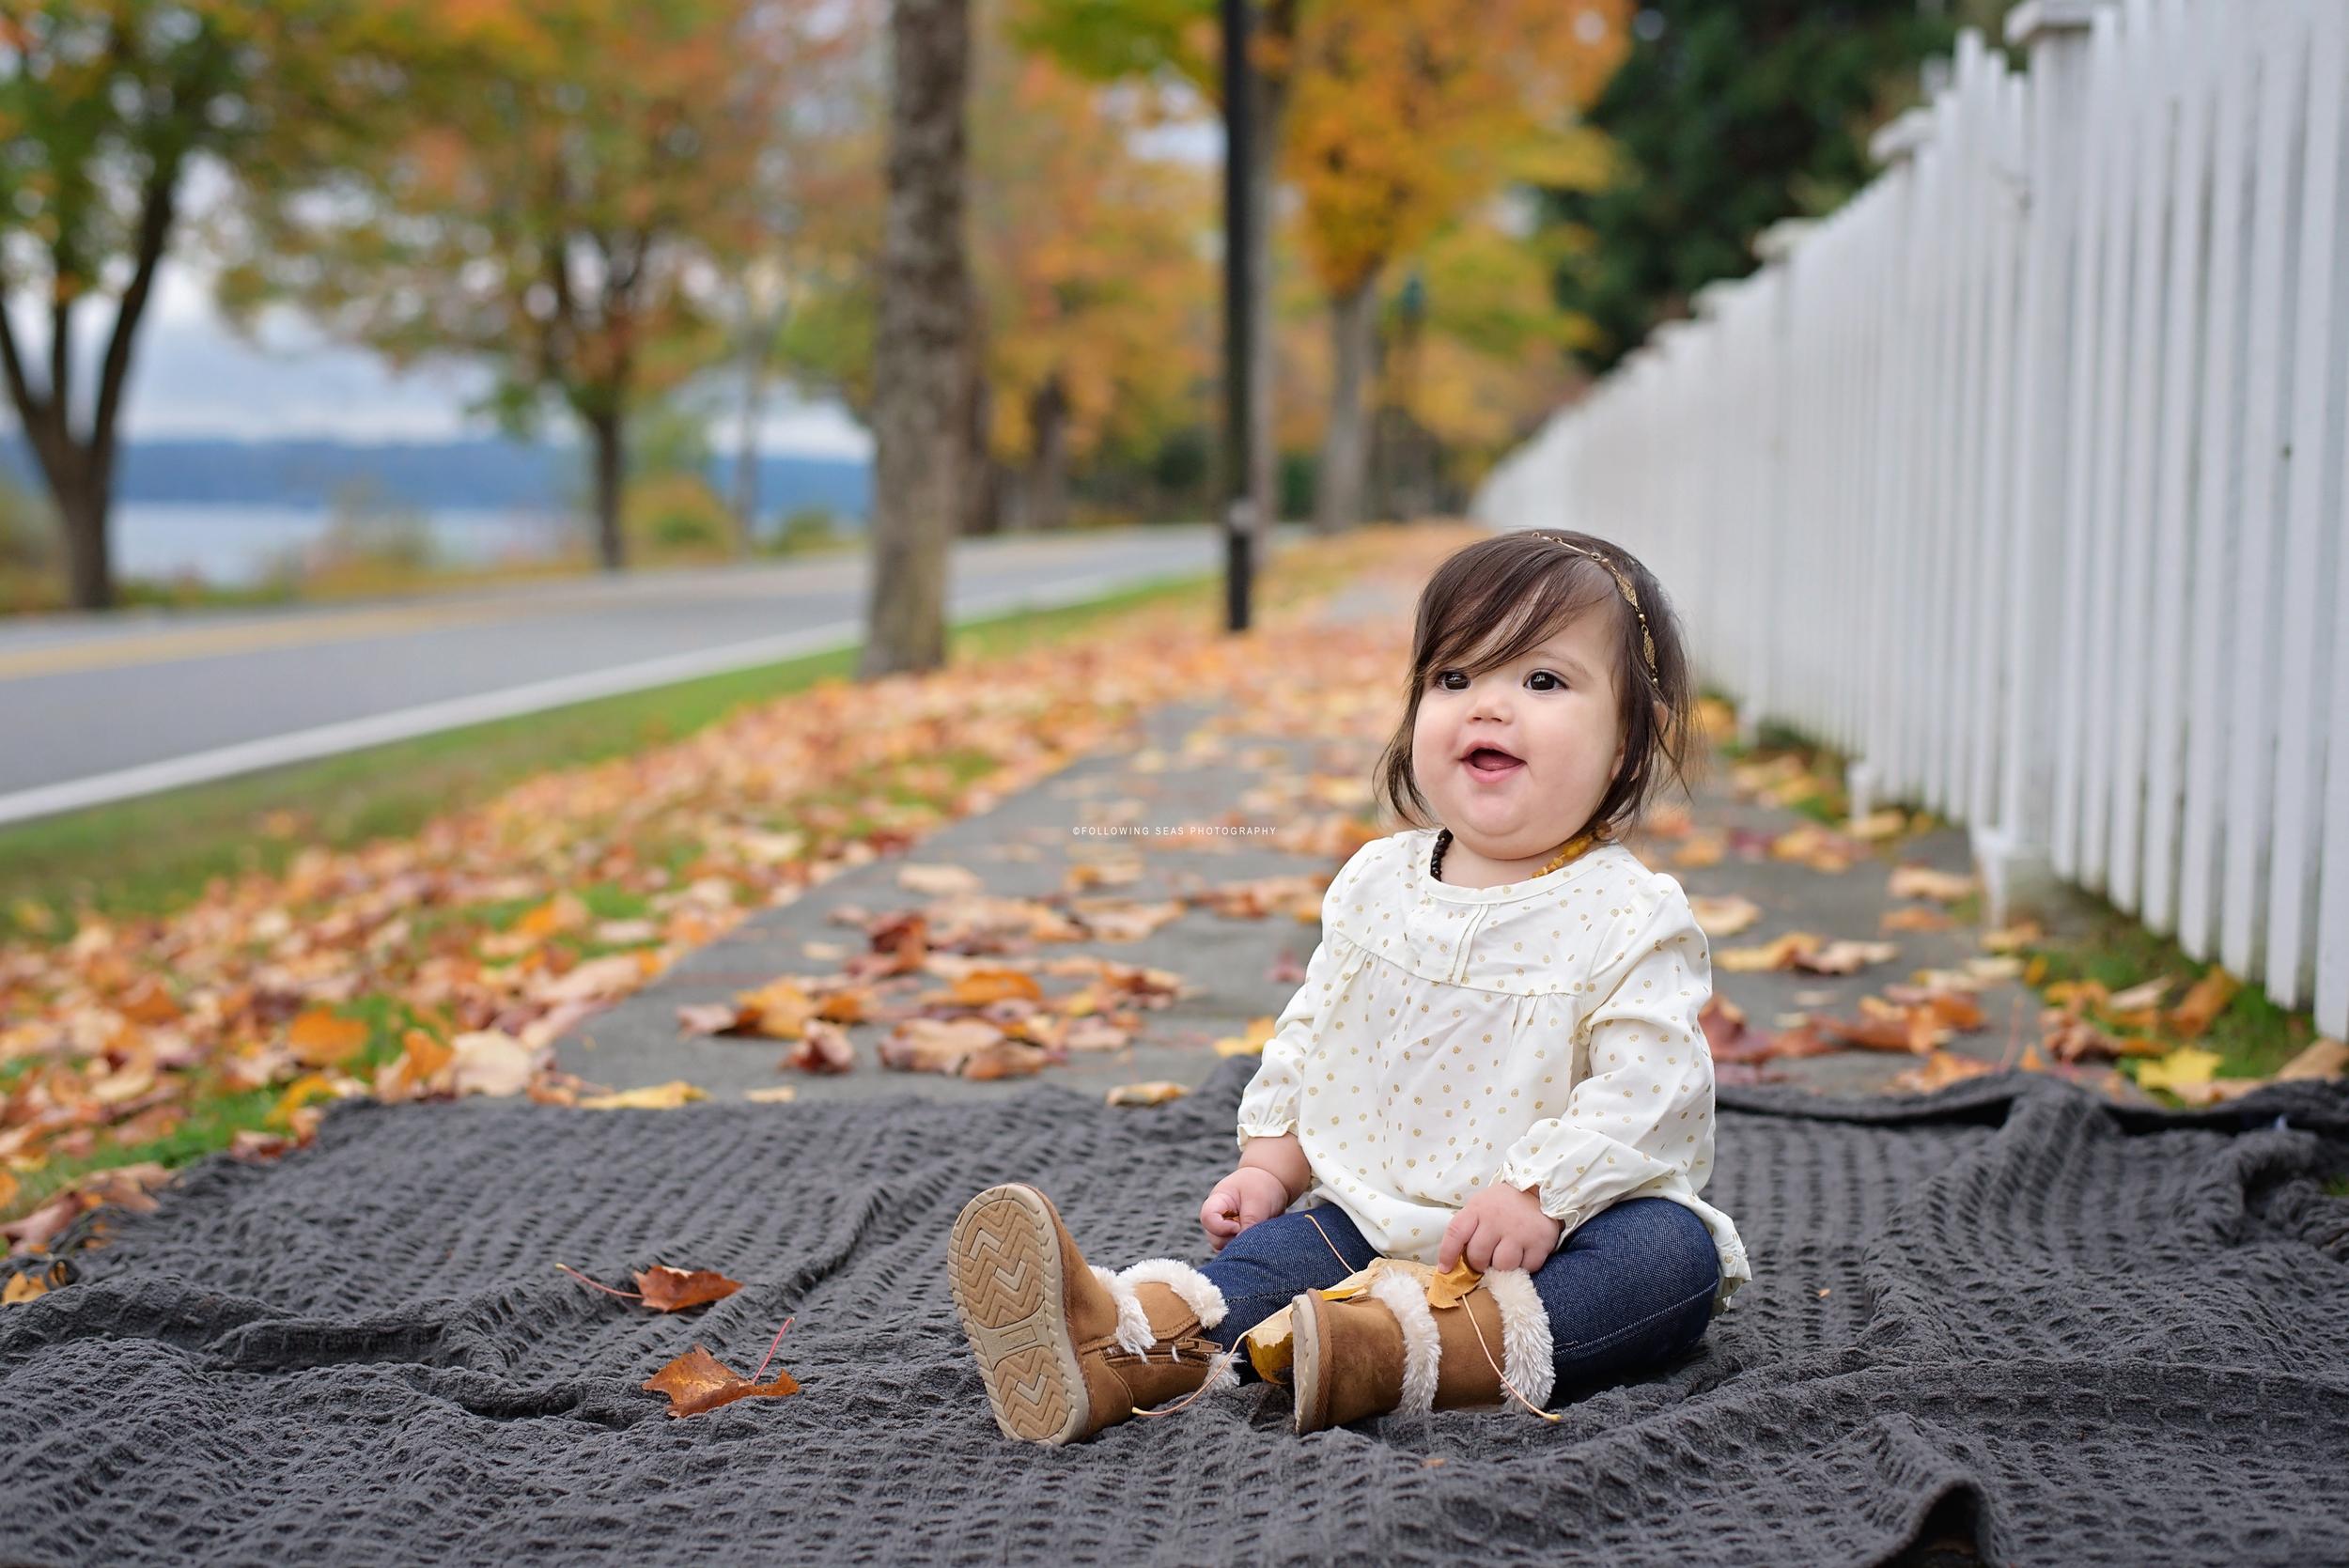 Bremerton-Family-Photographer-Following-Seas-Photography-18 copy.jpg